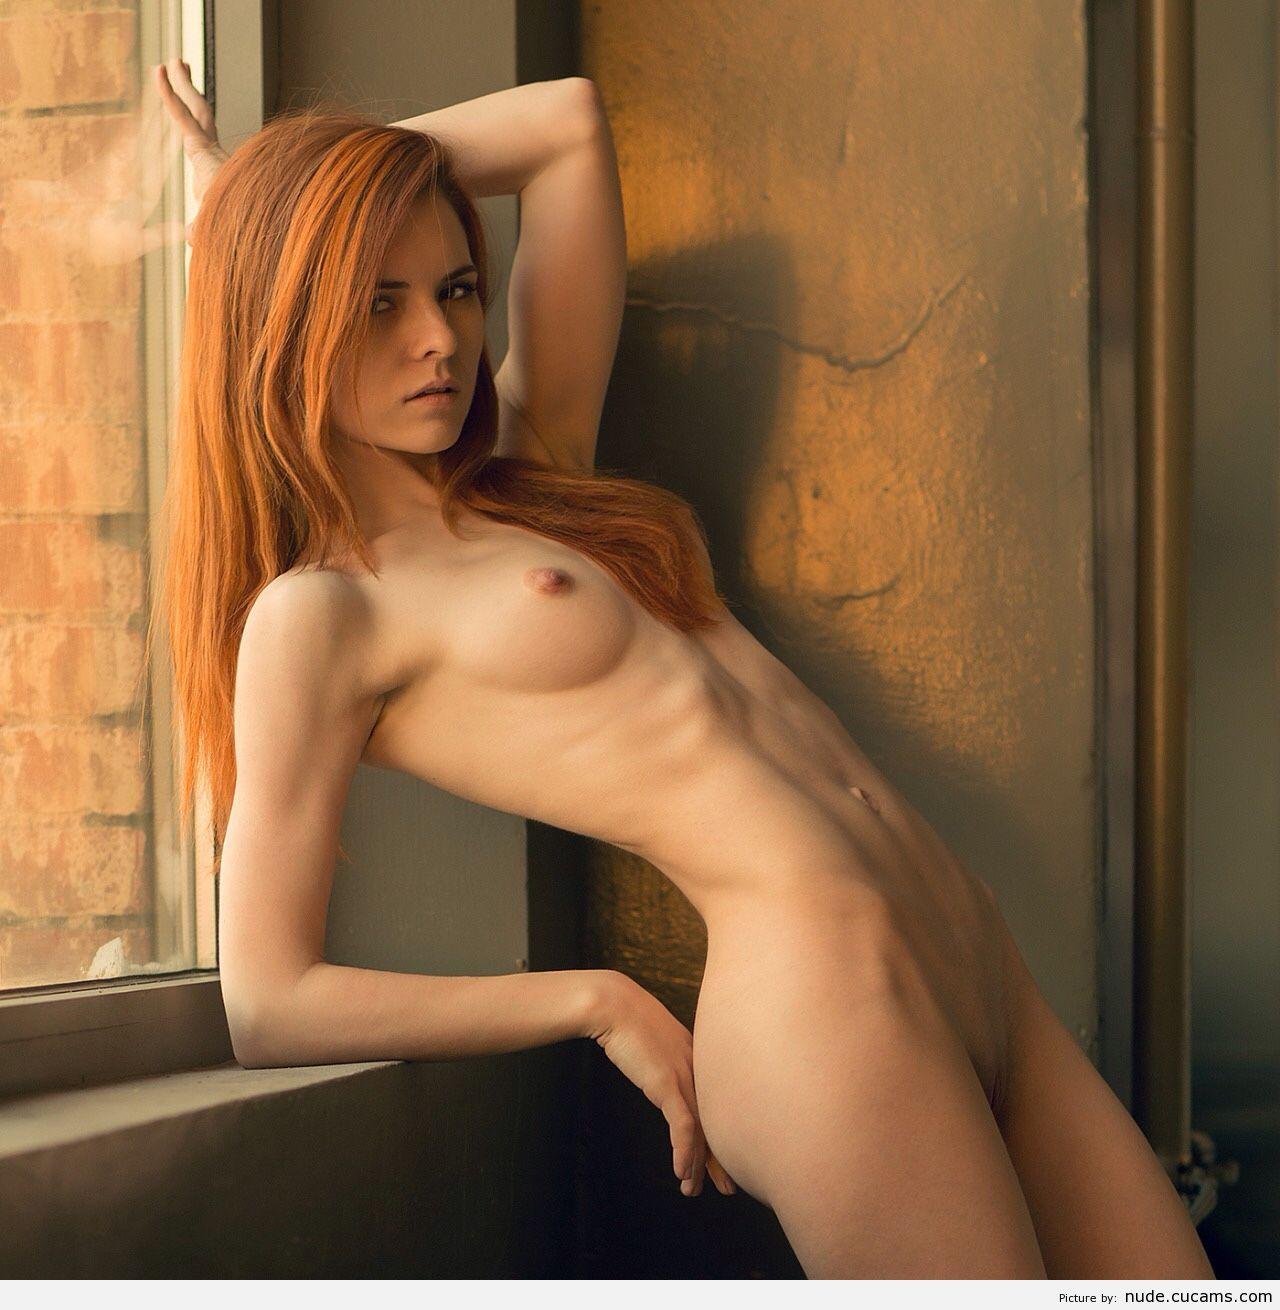 Nude Reverse Parody by nude.cucams.com